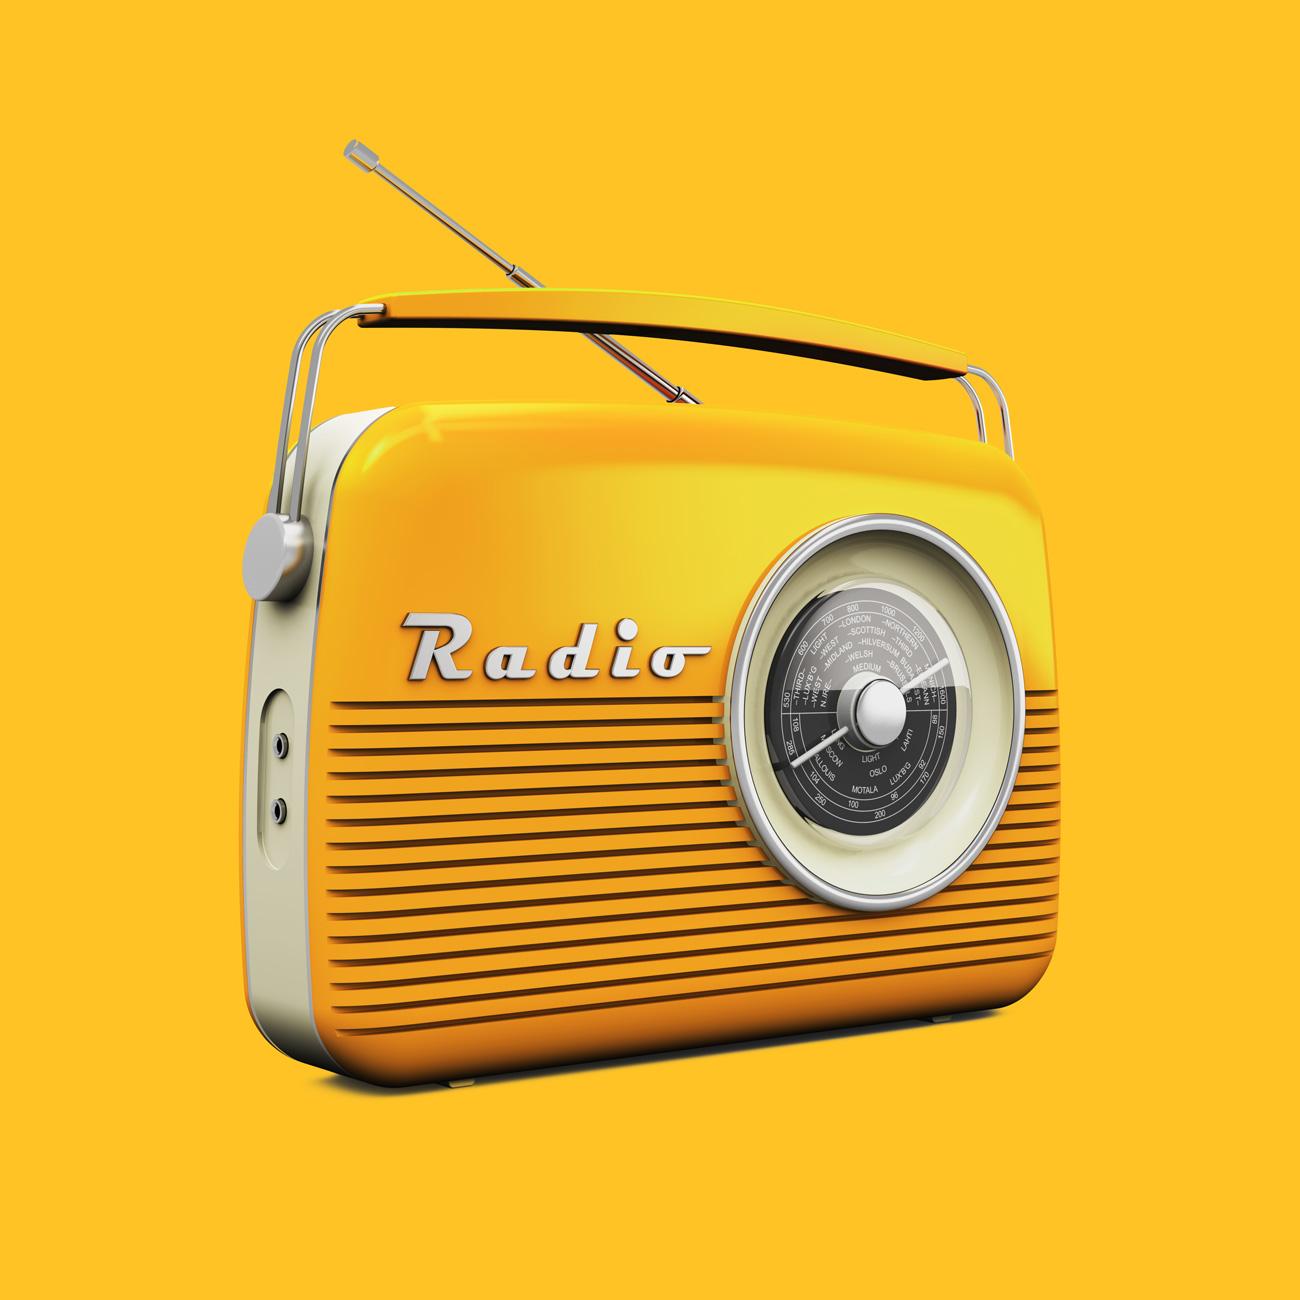 Radio Advertising visualization